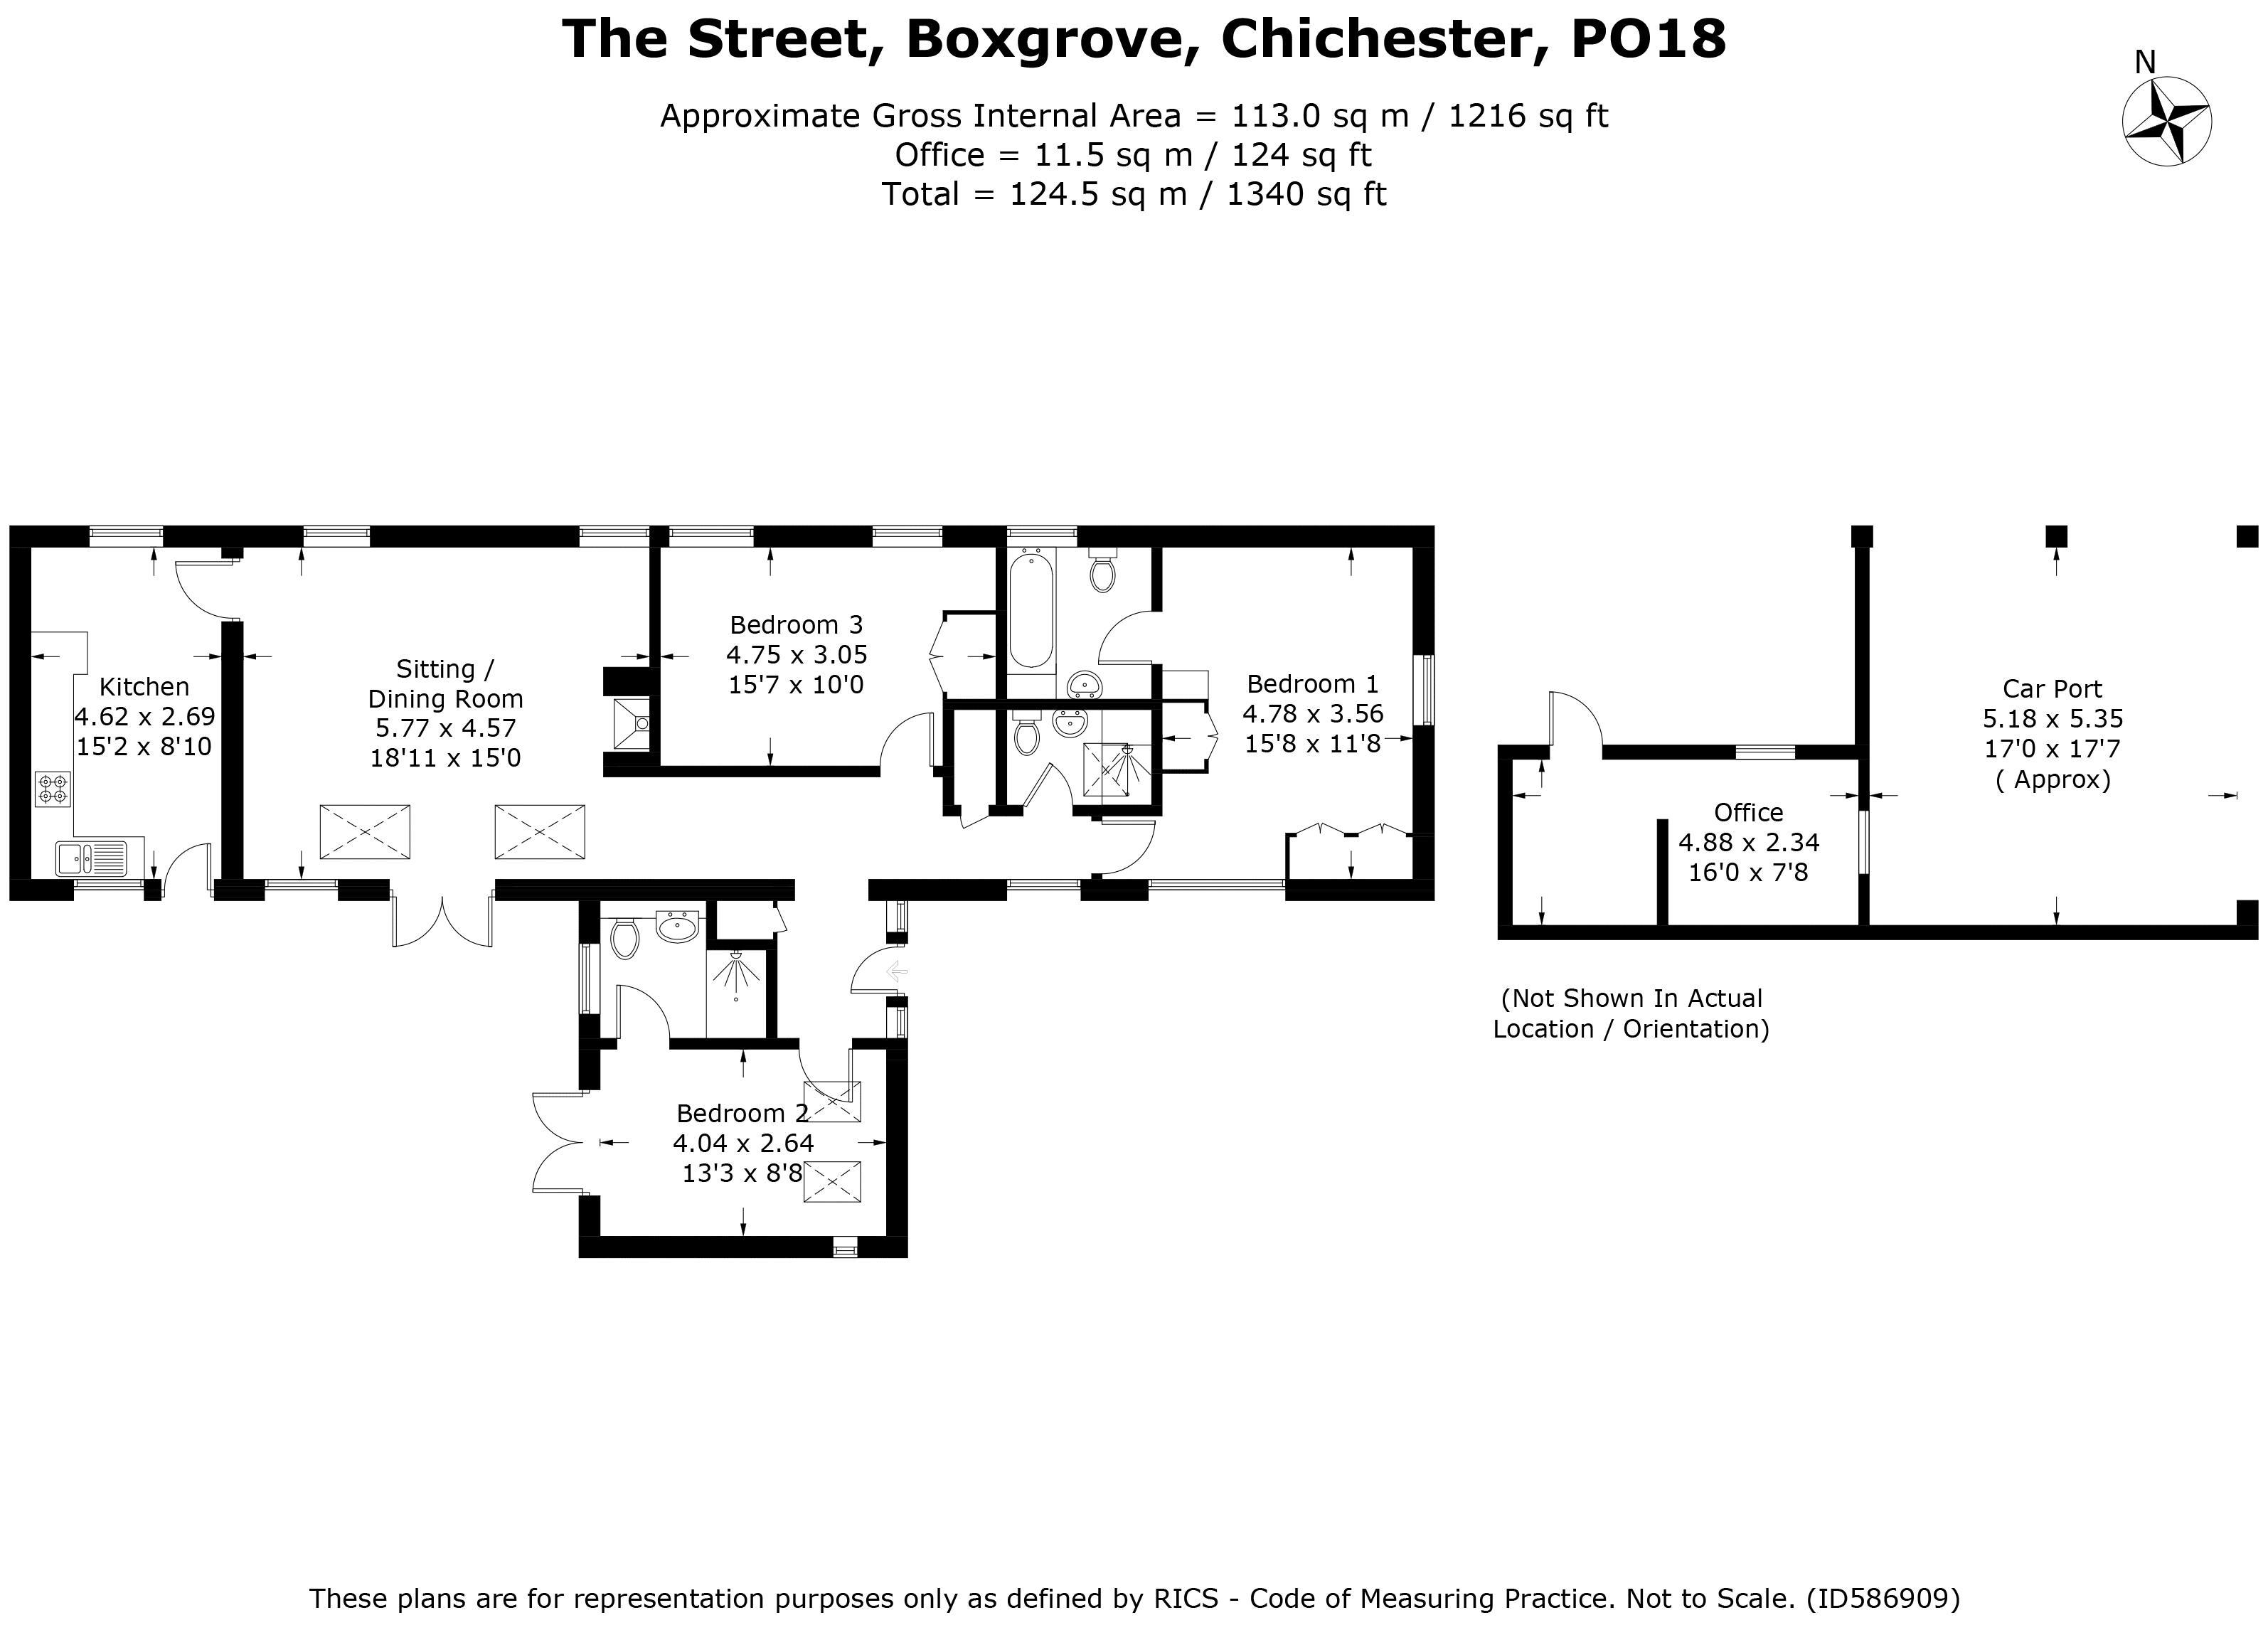 The Street Boxgrove